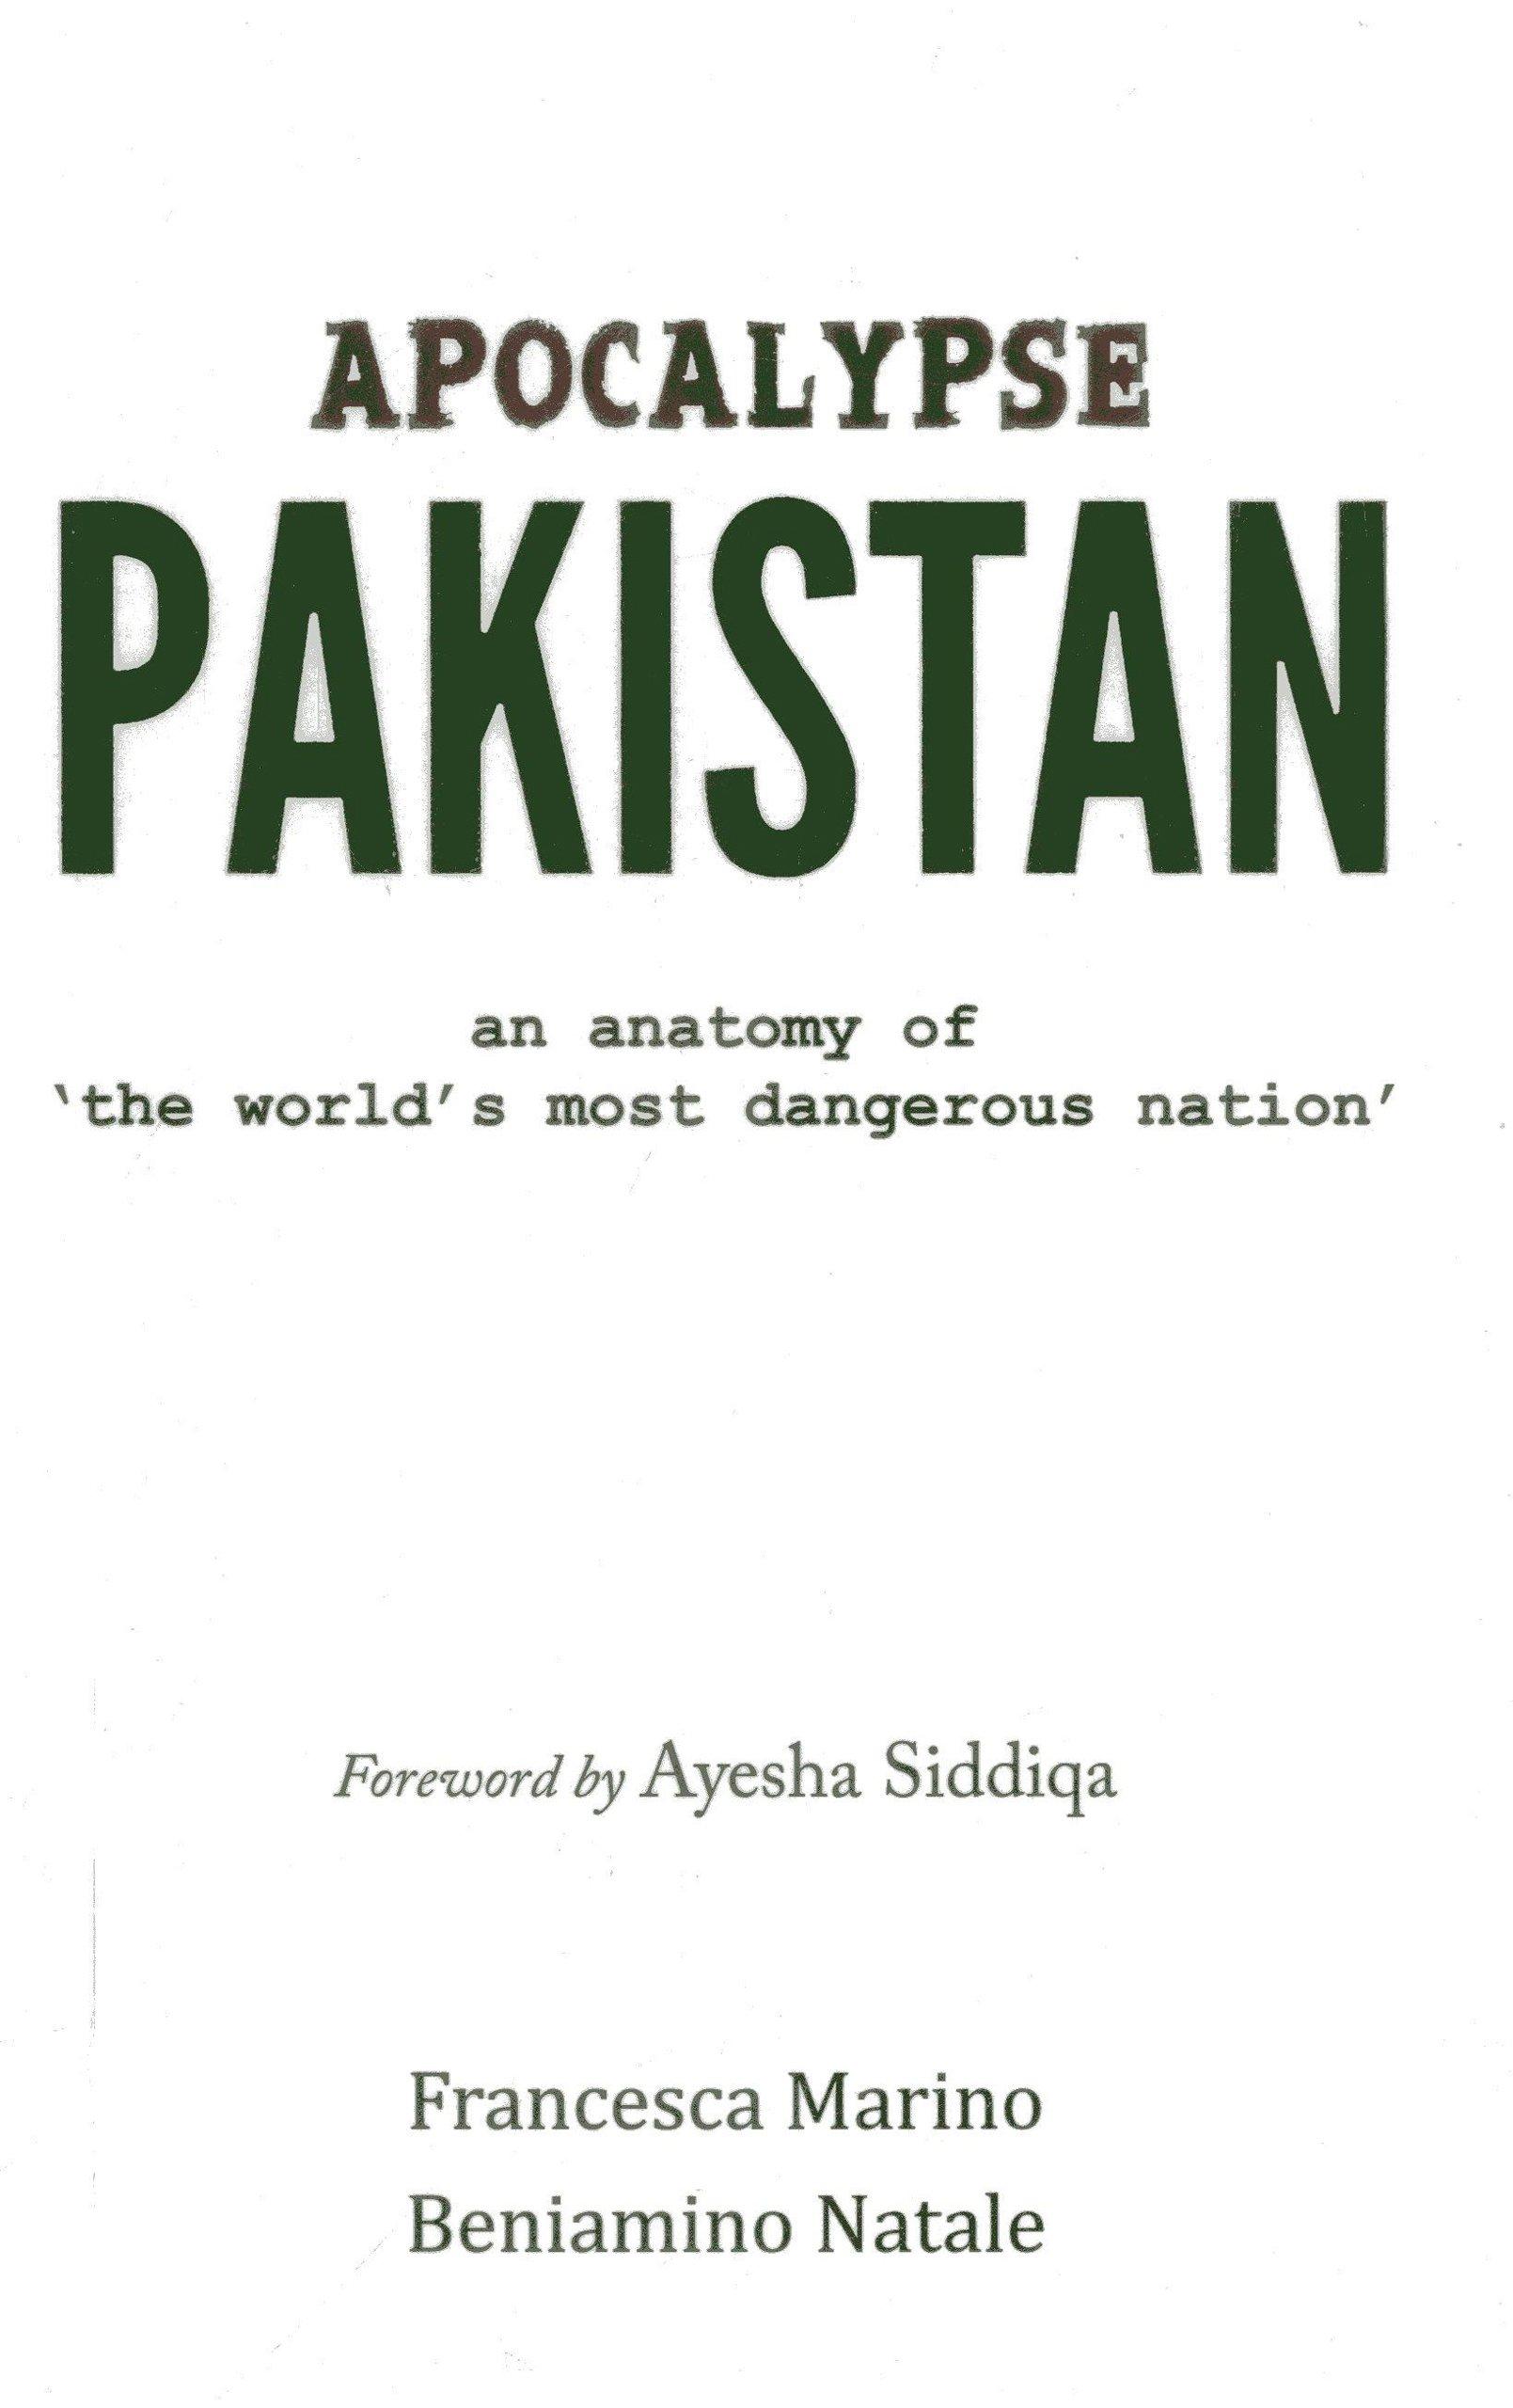 Apocalypse Pakistan: An Anatomy of the World's Most Dangerous Nation